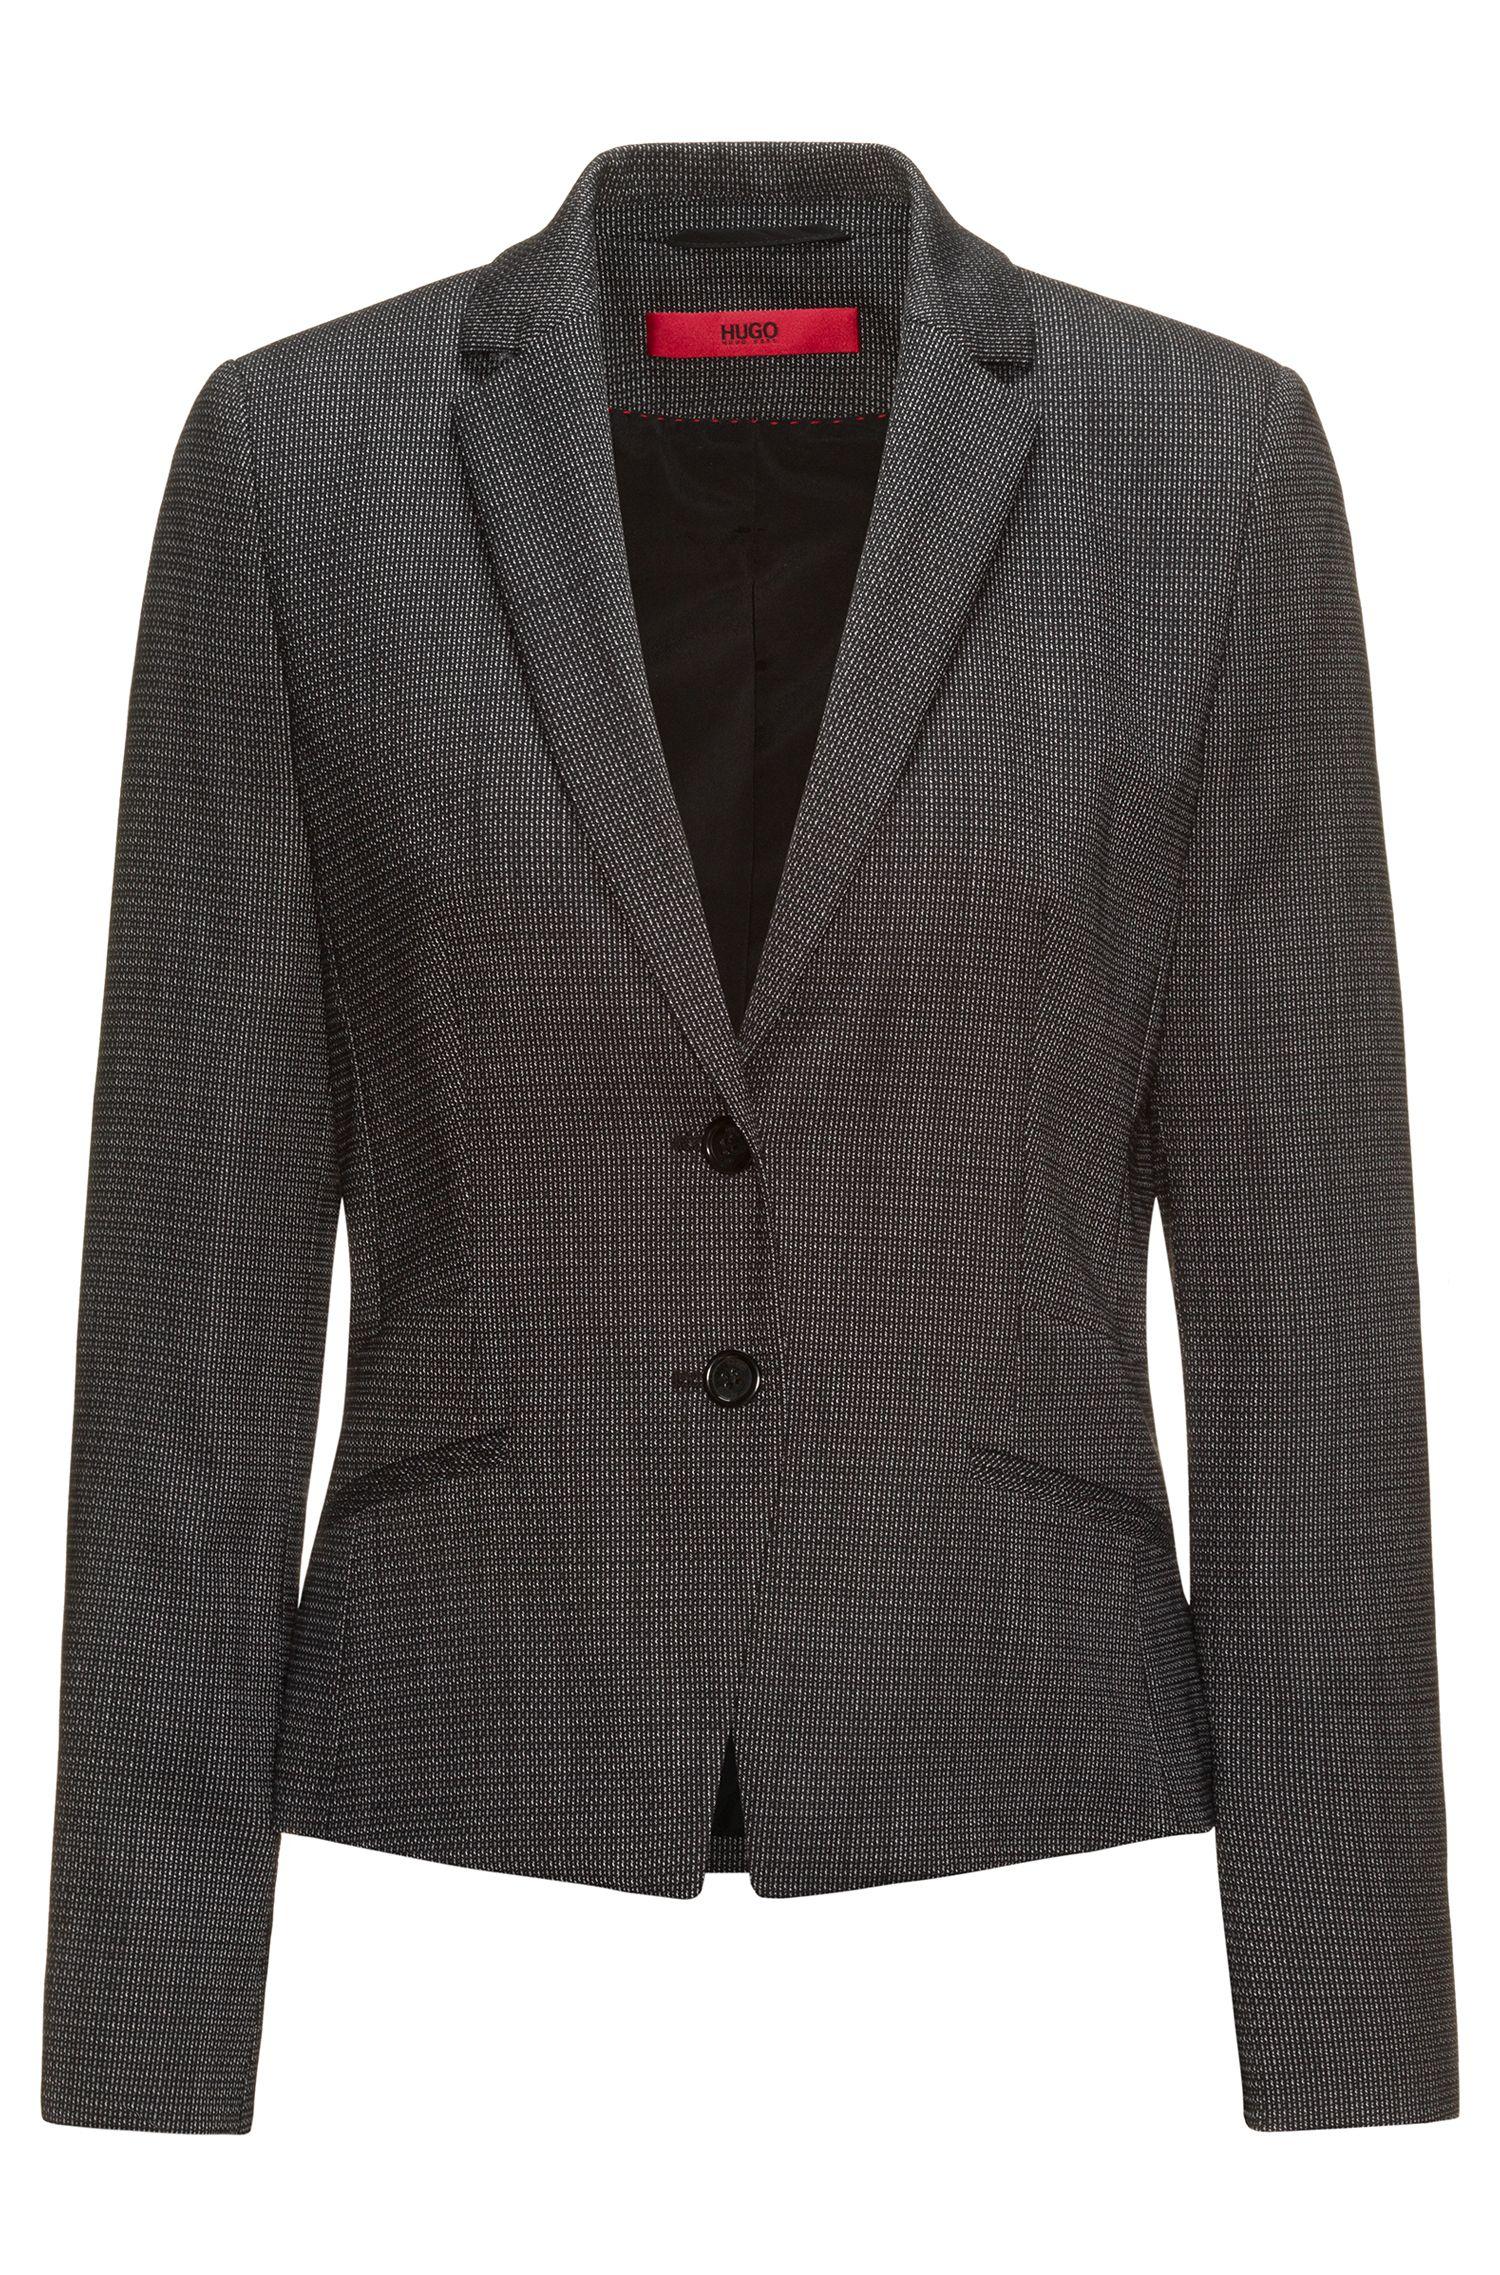 Giacca regular fit in lana elasticizzata lavorata